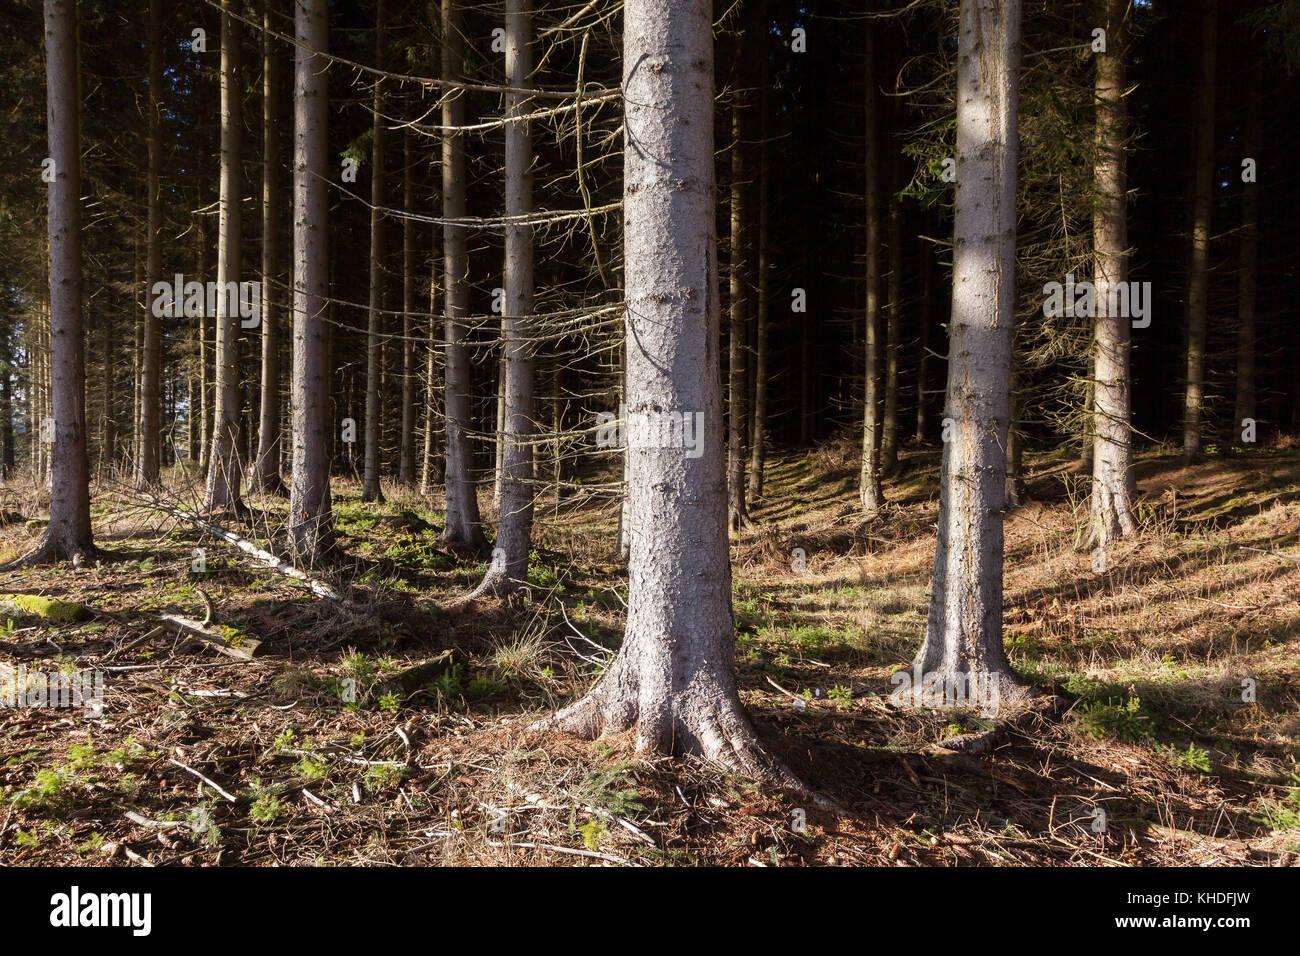 Wald - Stock Image